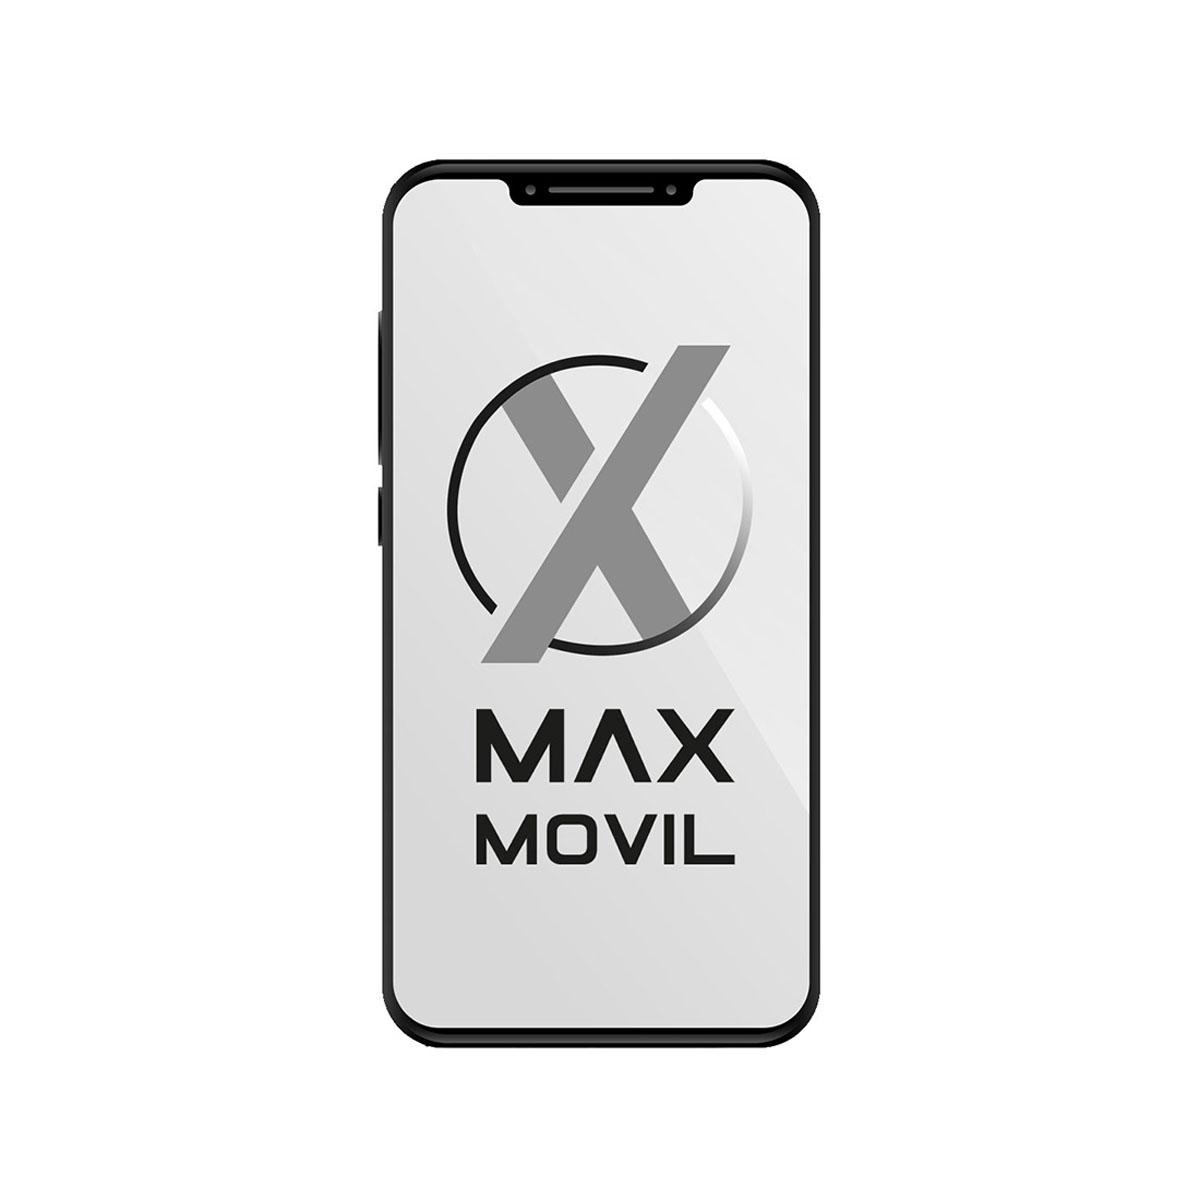 Carcasa MyAxe tipo TPU para Ascend Y360 transparente con puntos